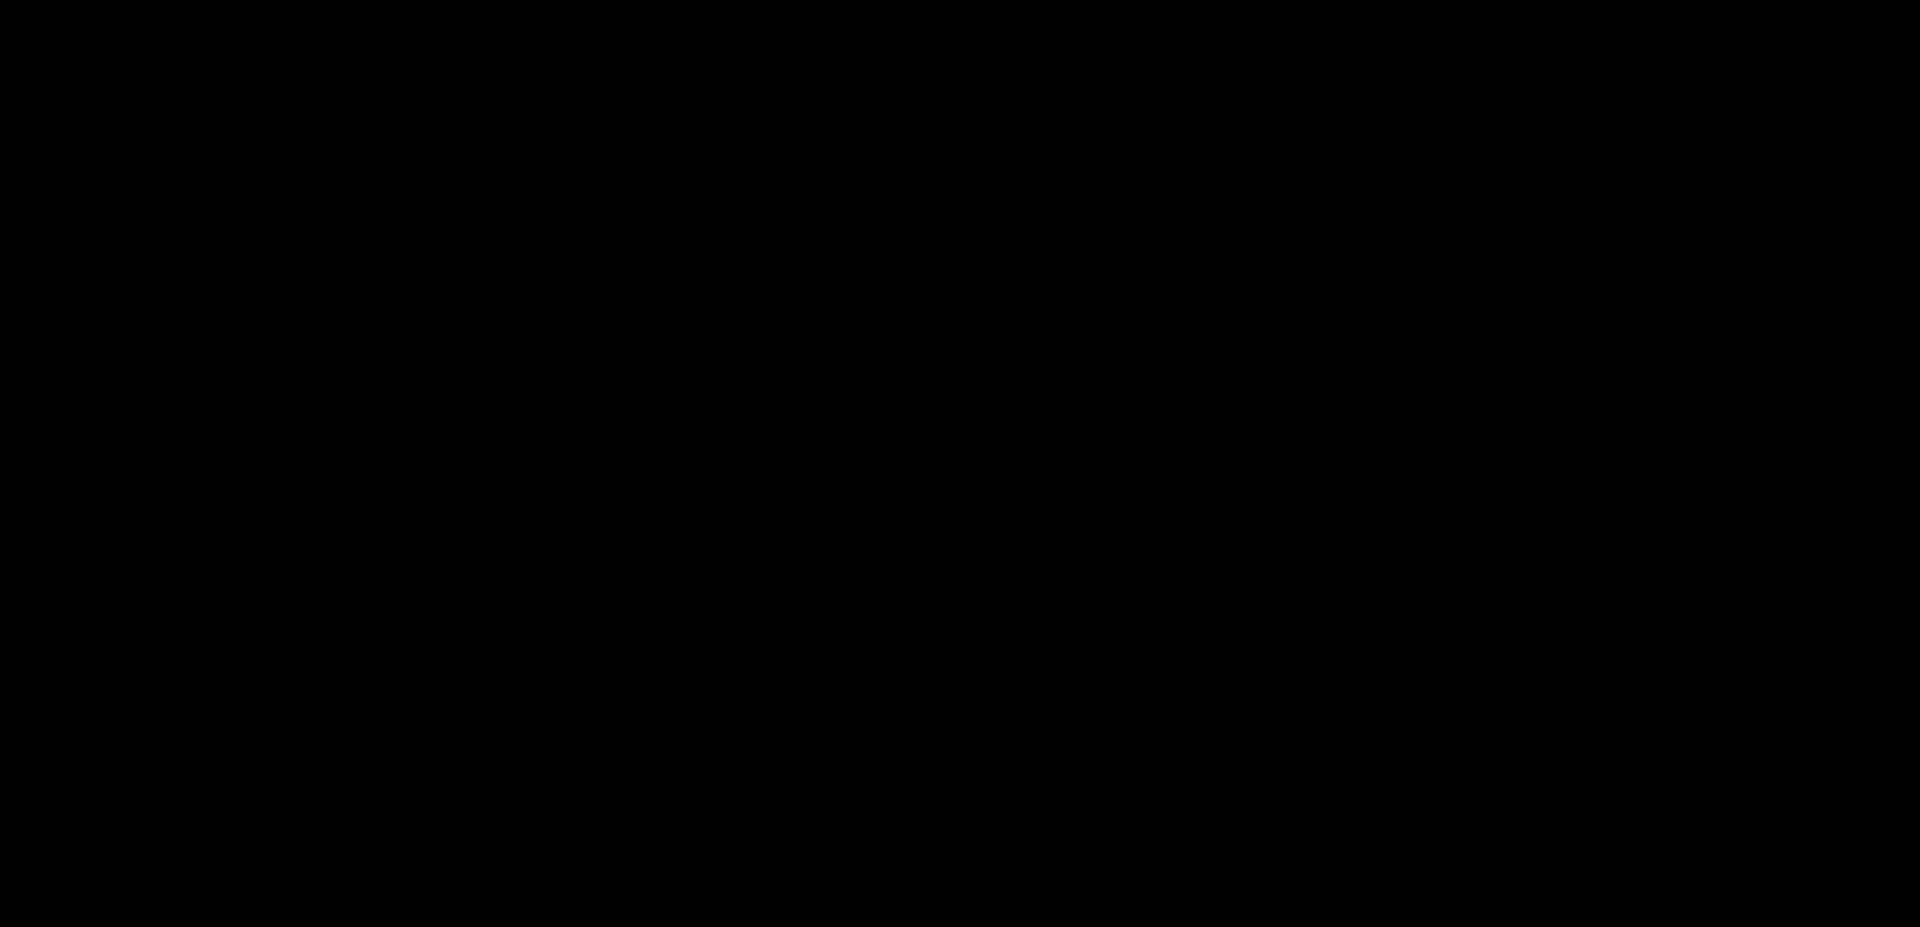 Image of black rectangle